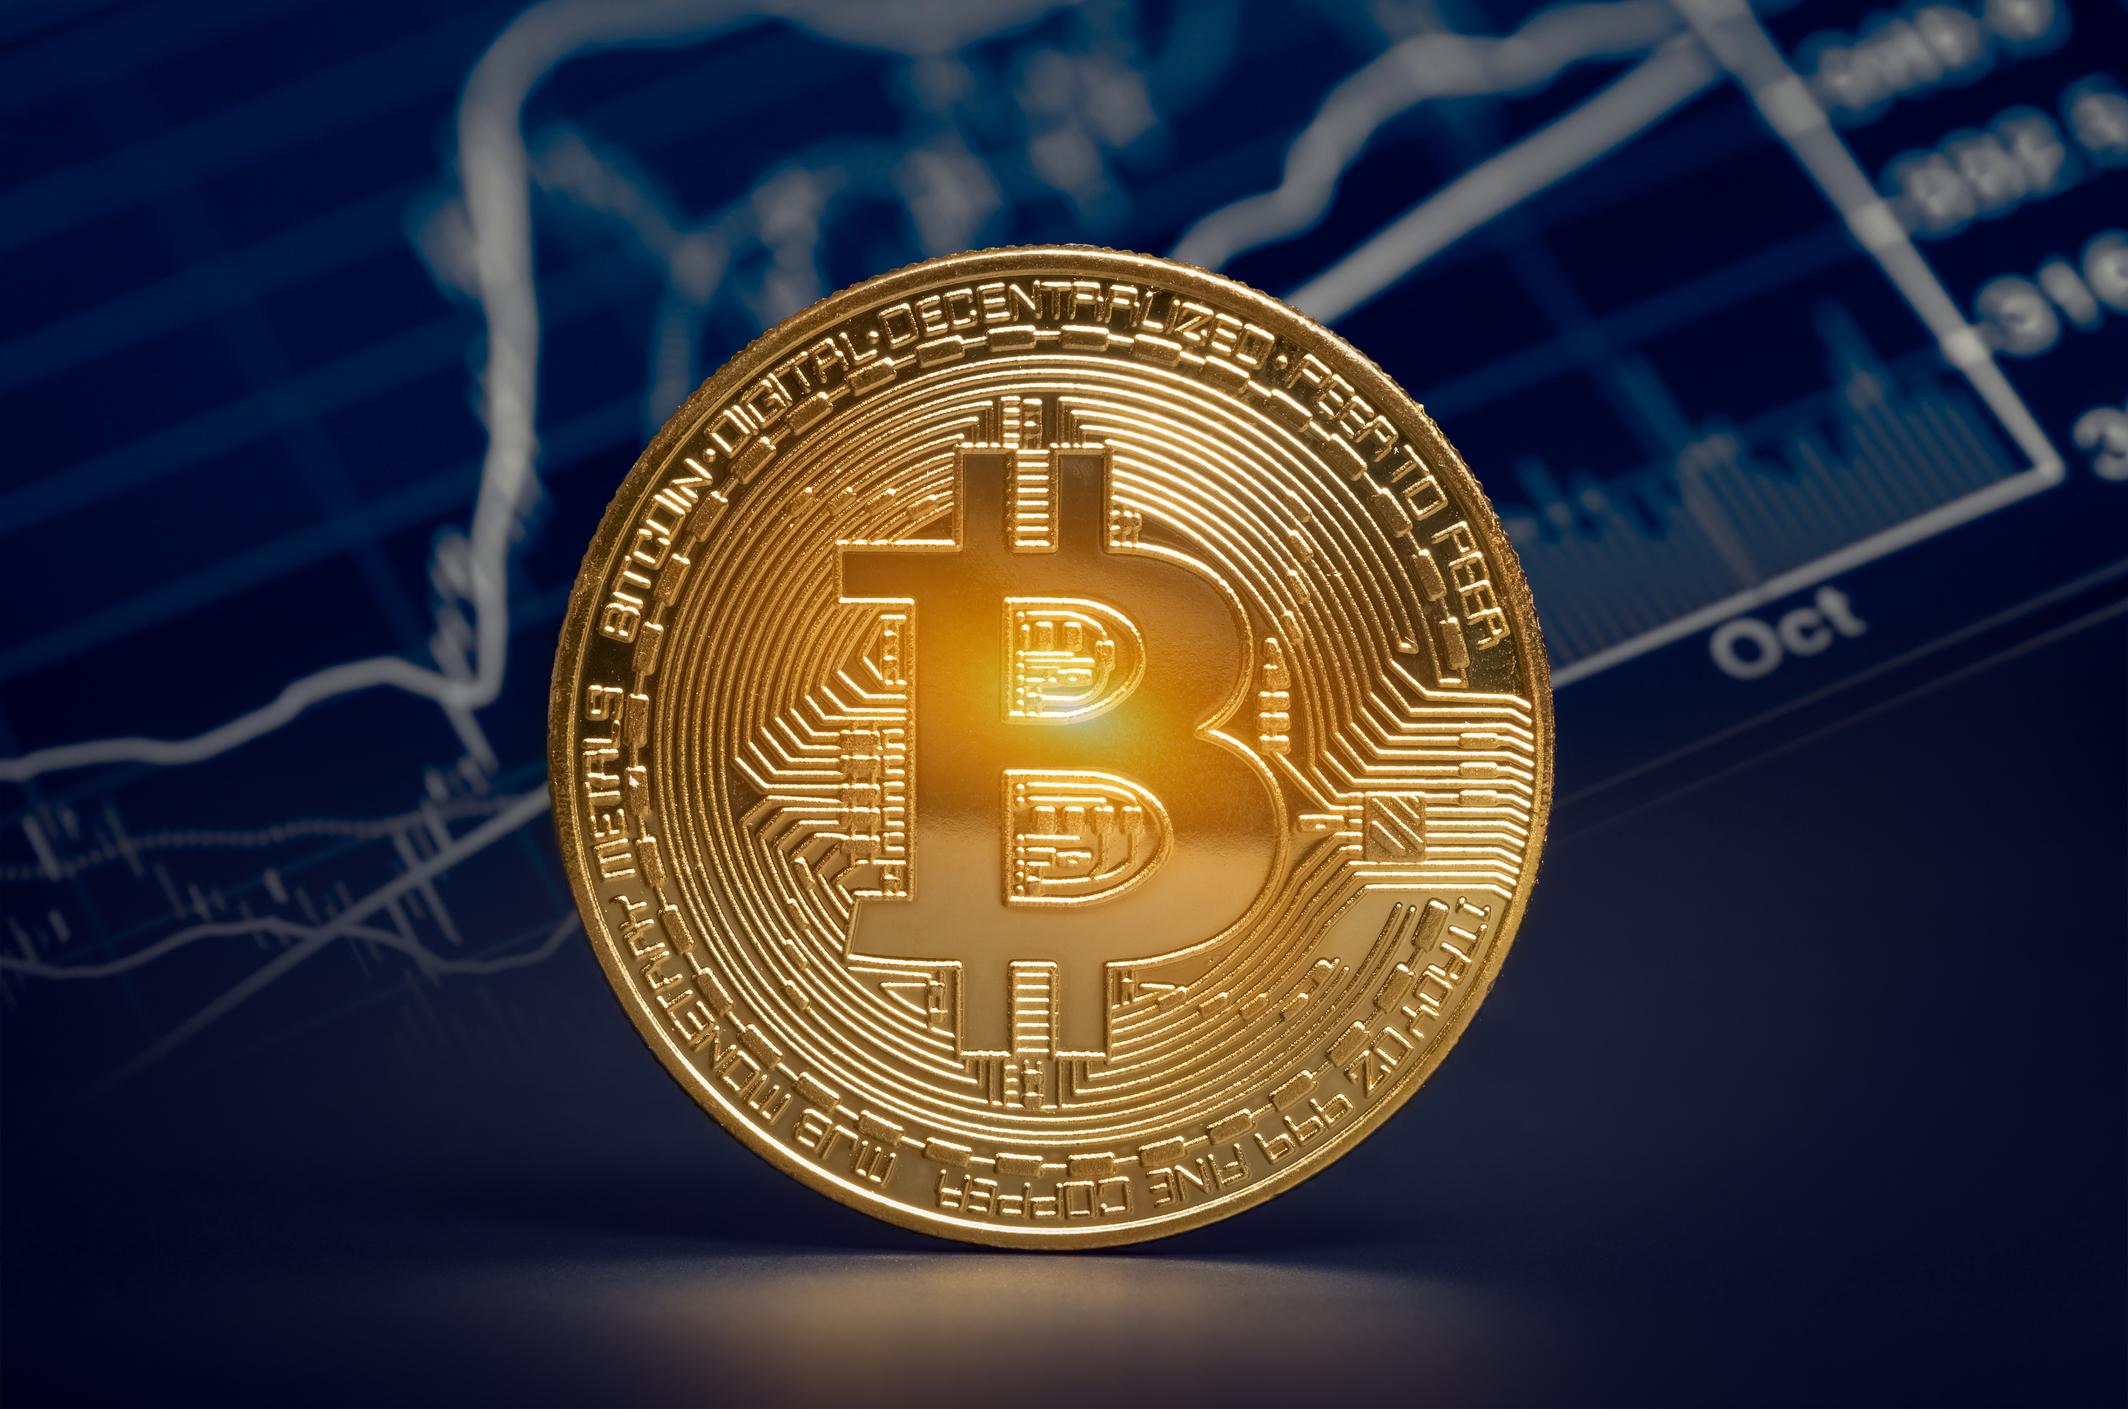 Gold token with bitcoin symbol.